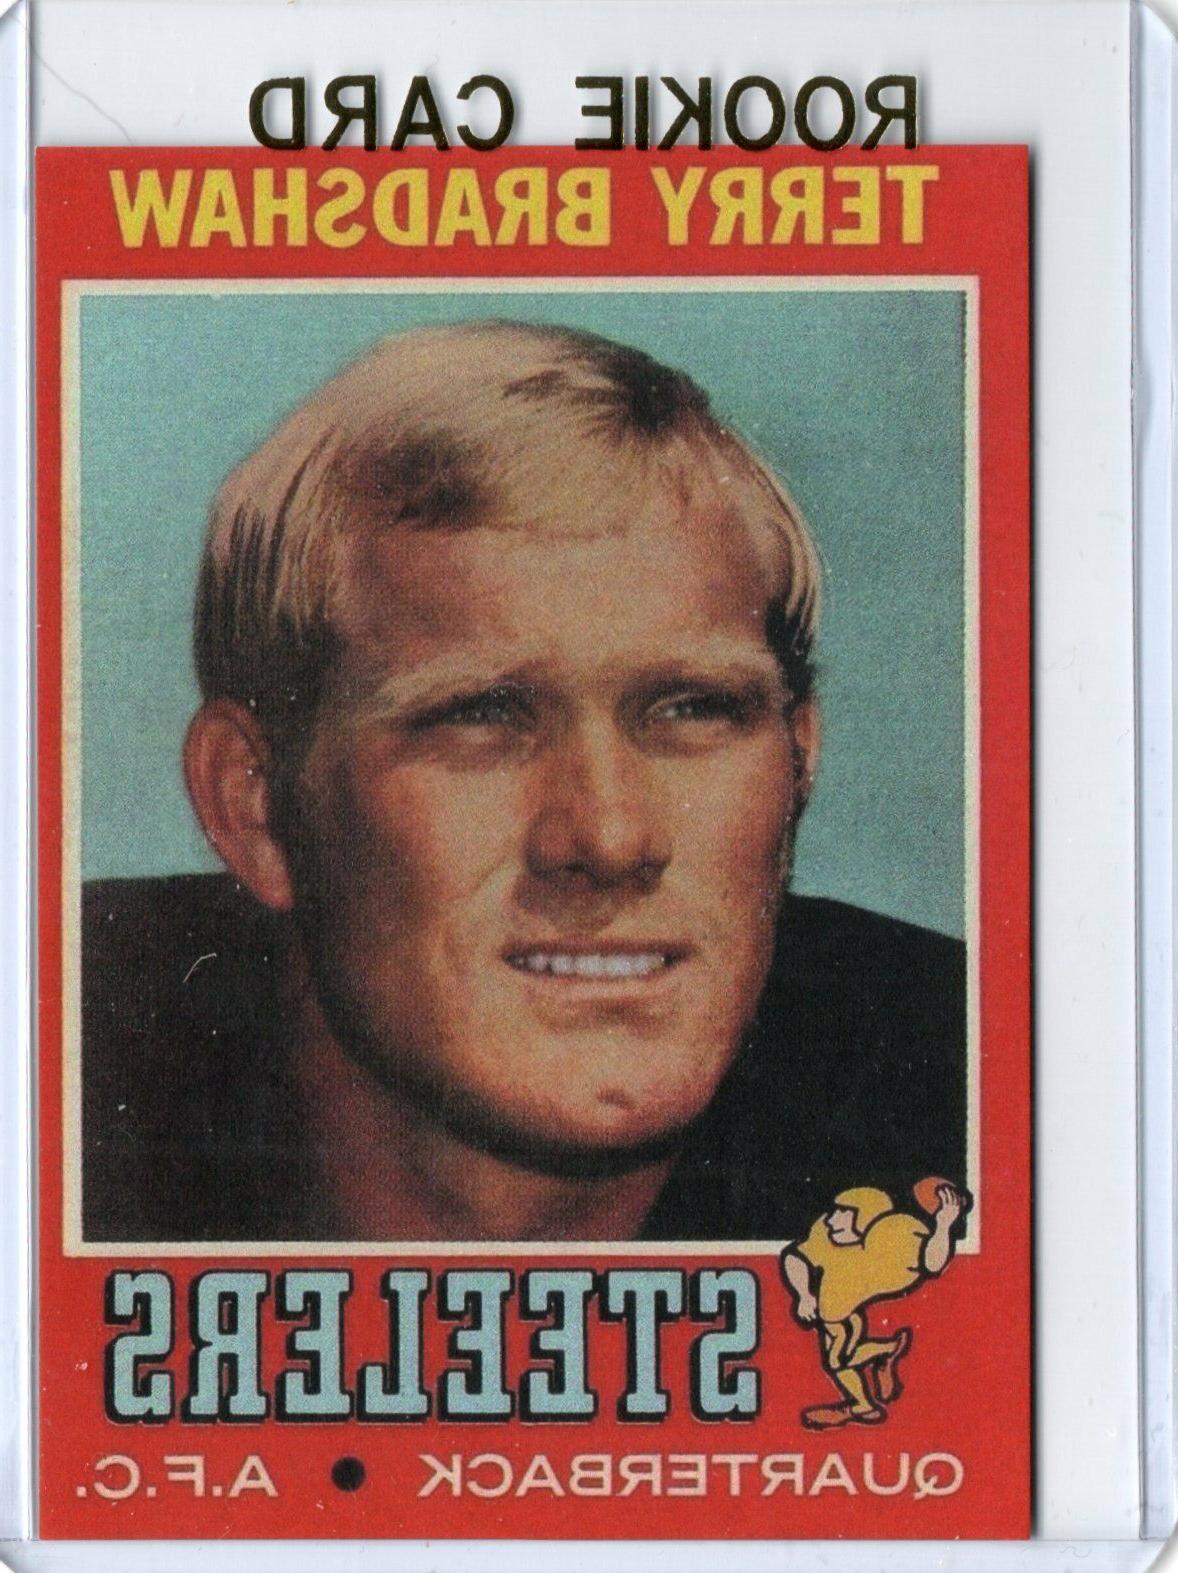 terry bradshaw 1971 t football rookie card